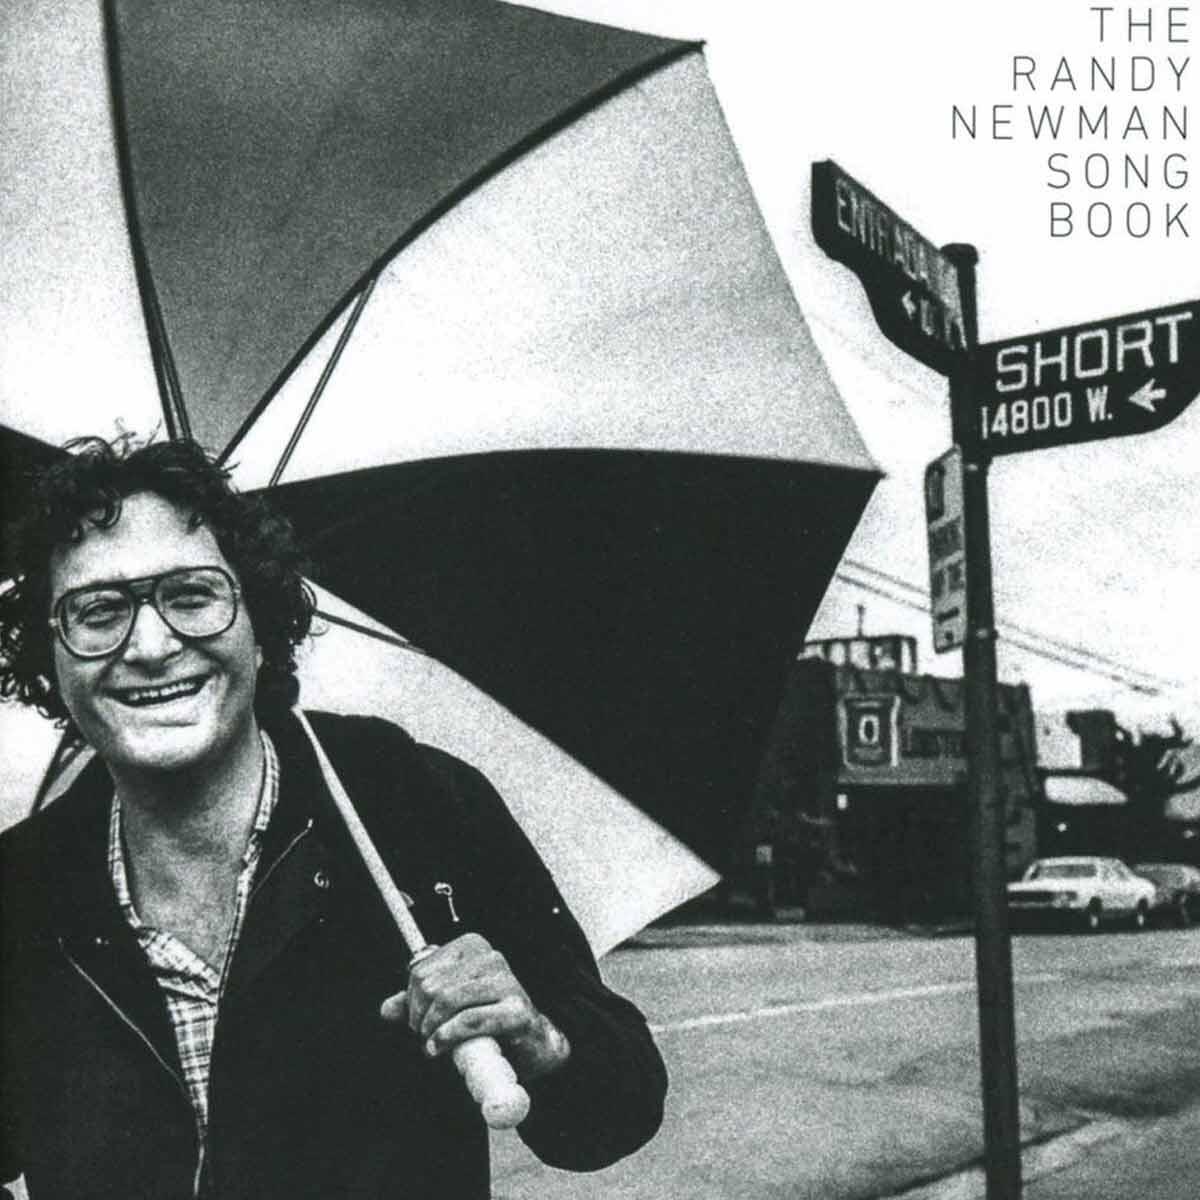 RANDY NEWMAN The Randy Newman Songbook